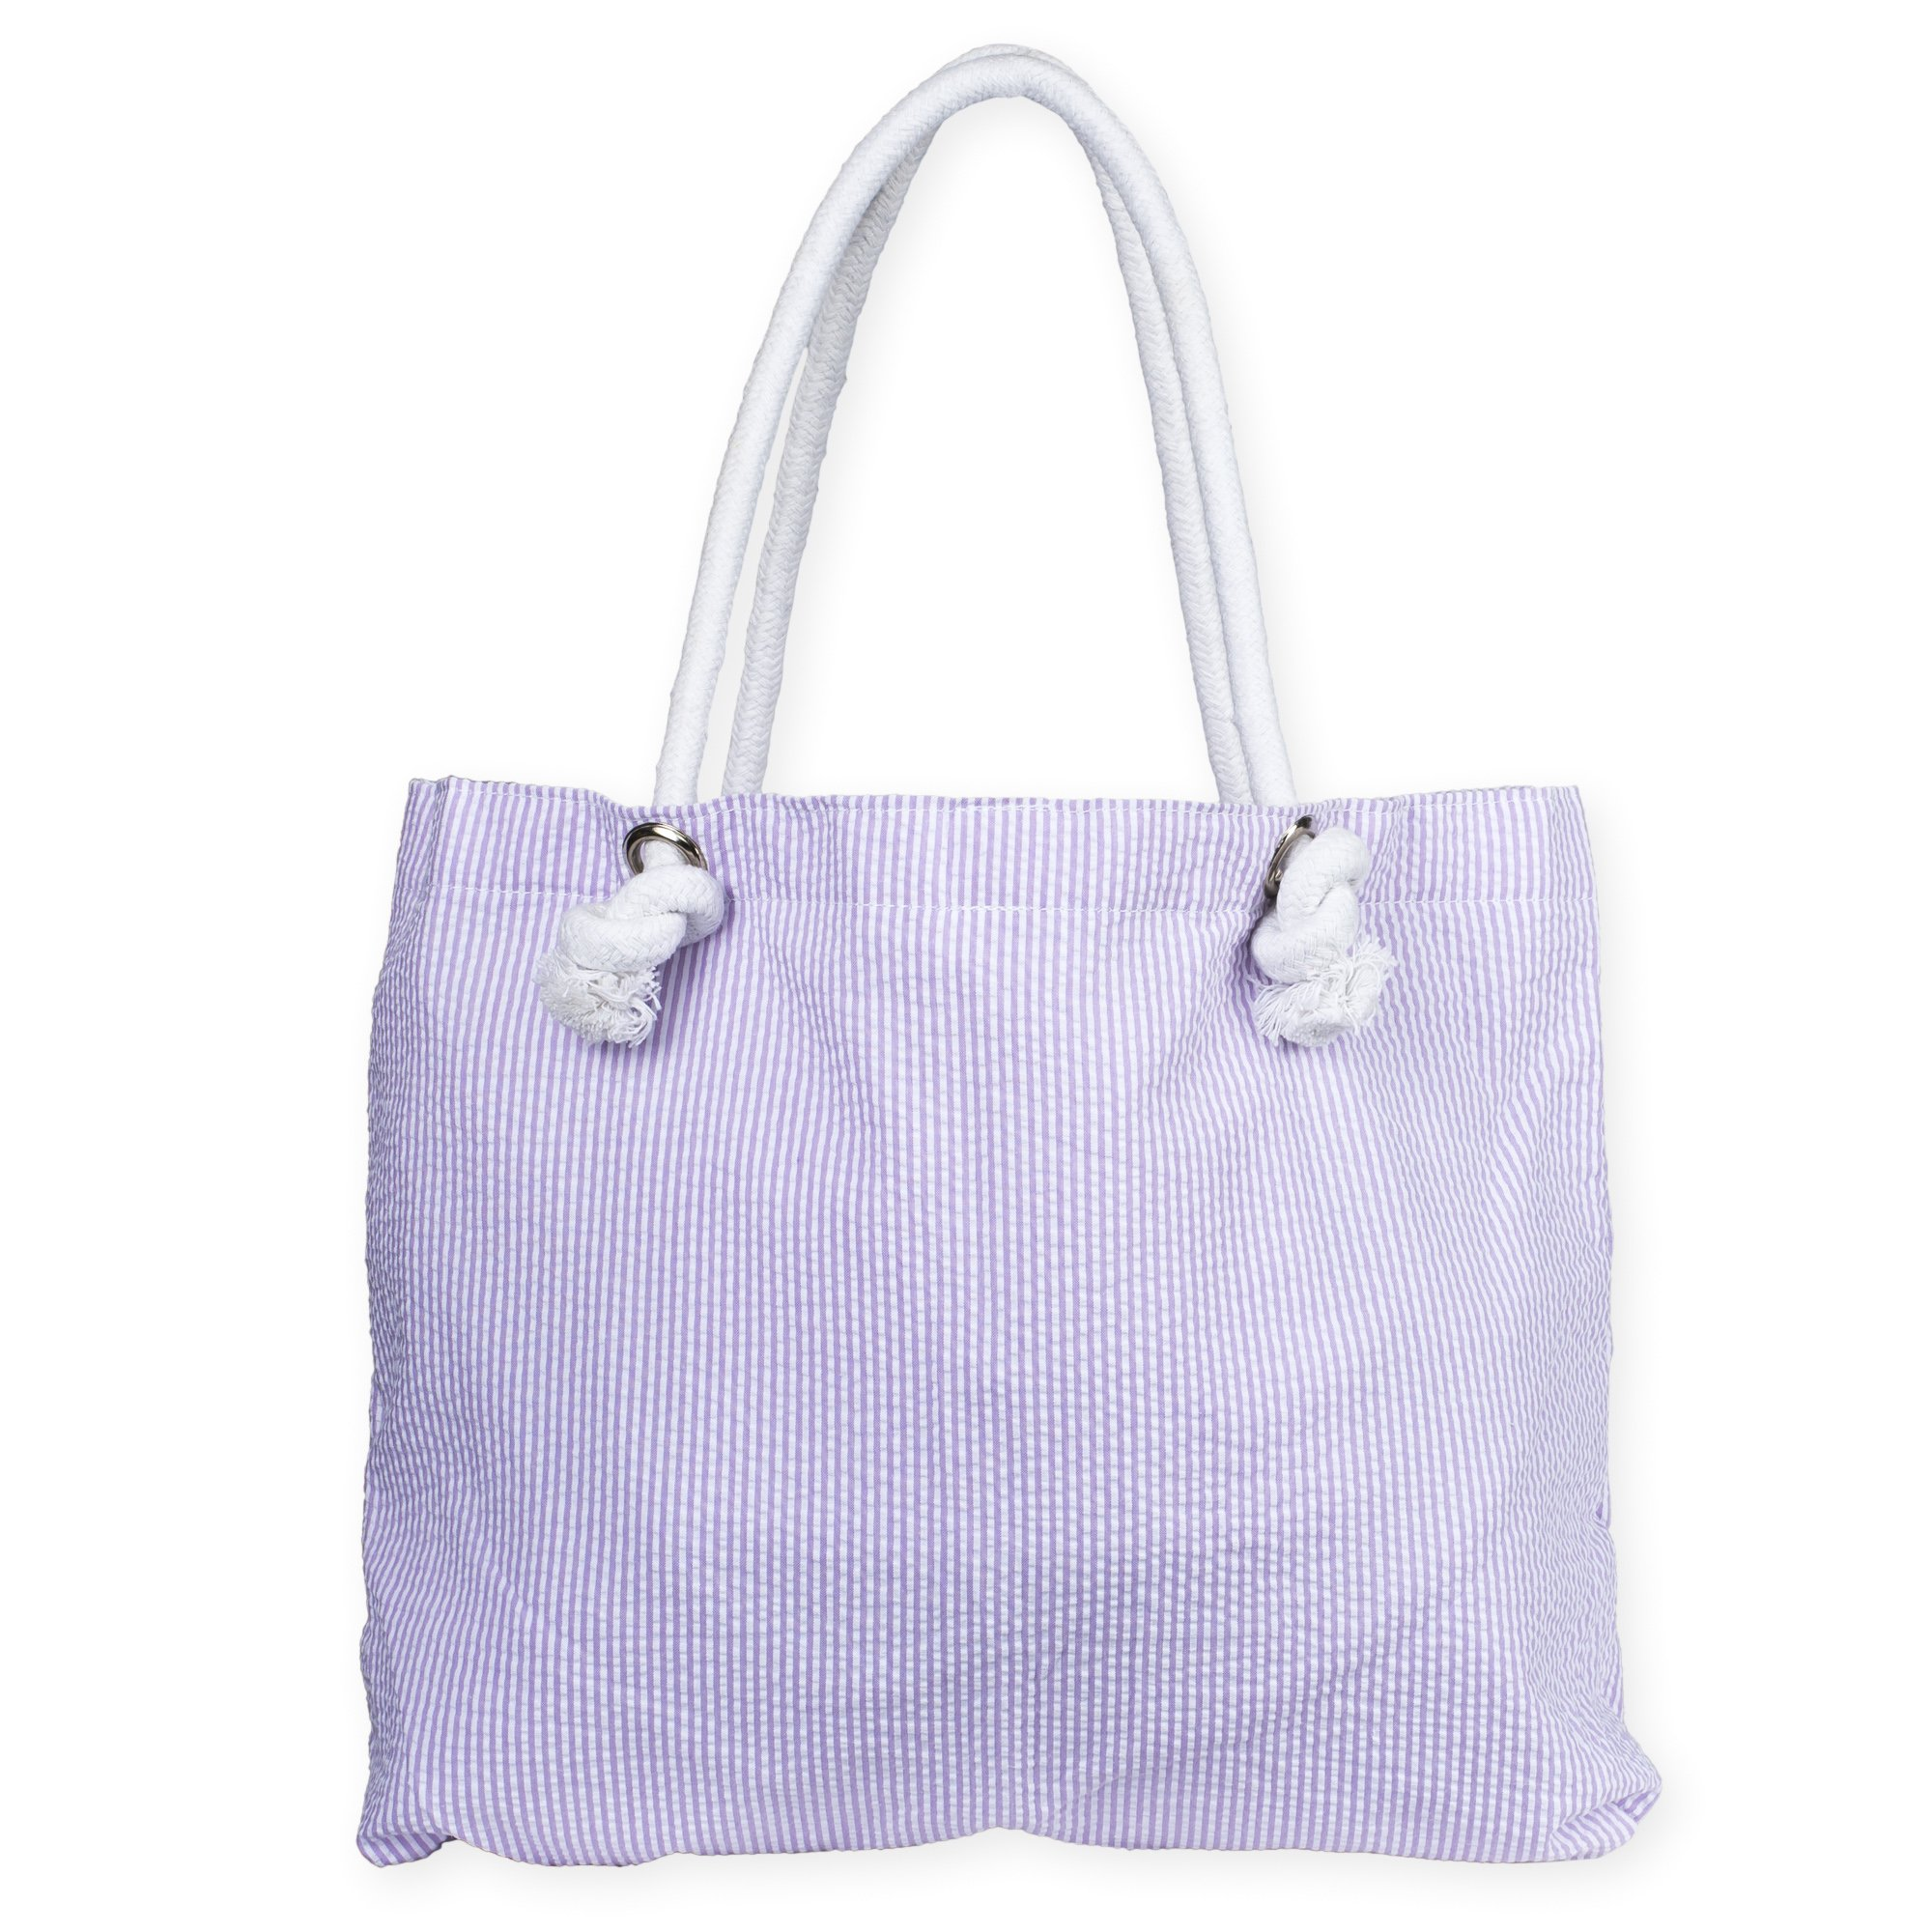 Rope Handle Inside Lined Everything Bag (Lilac Seersucker)